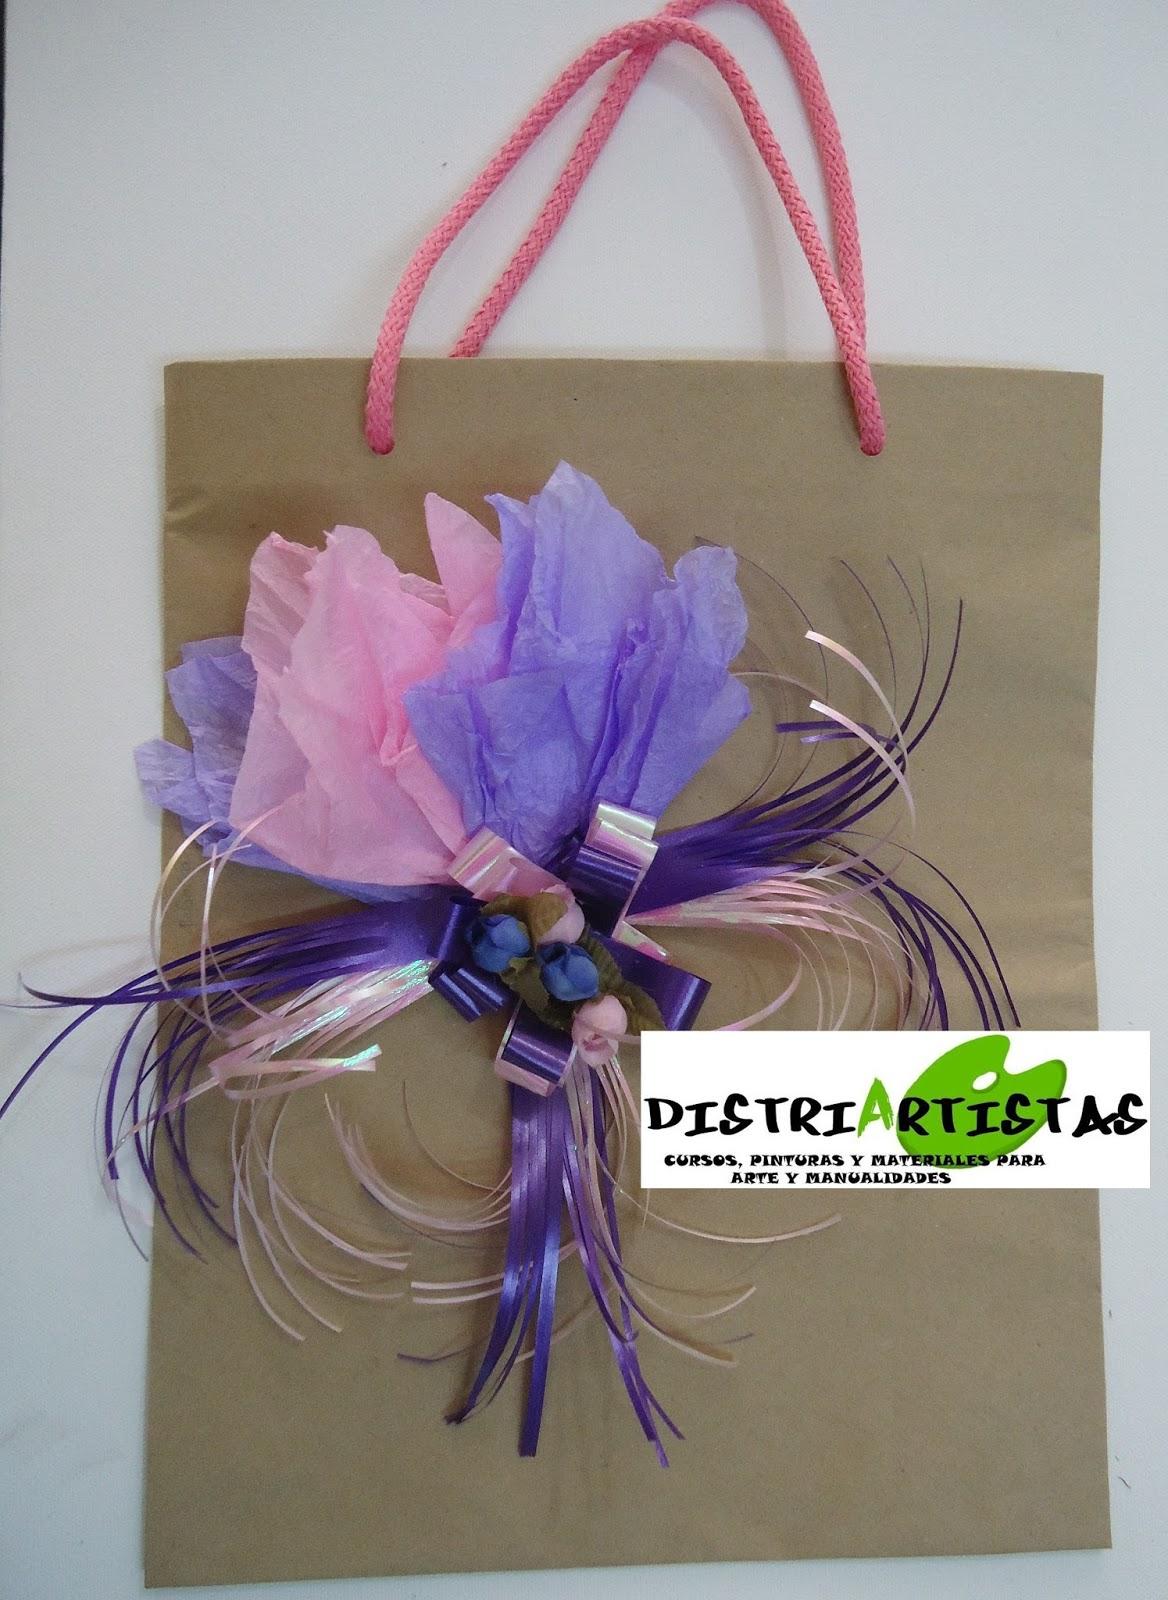 Distriartistas curso de bolsas de regalo mo os empaques - Bolsas de regalo personalizadas ...